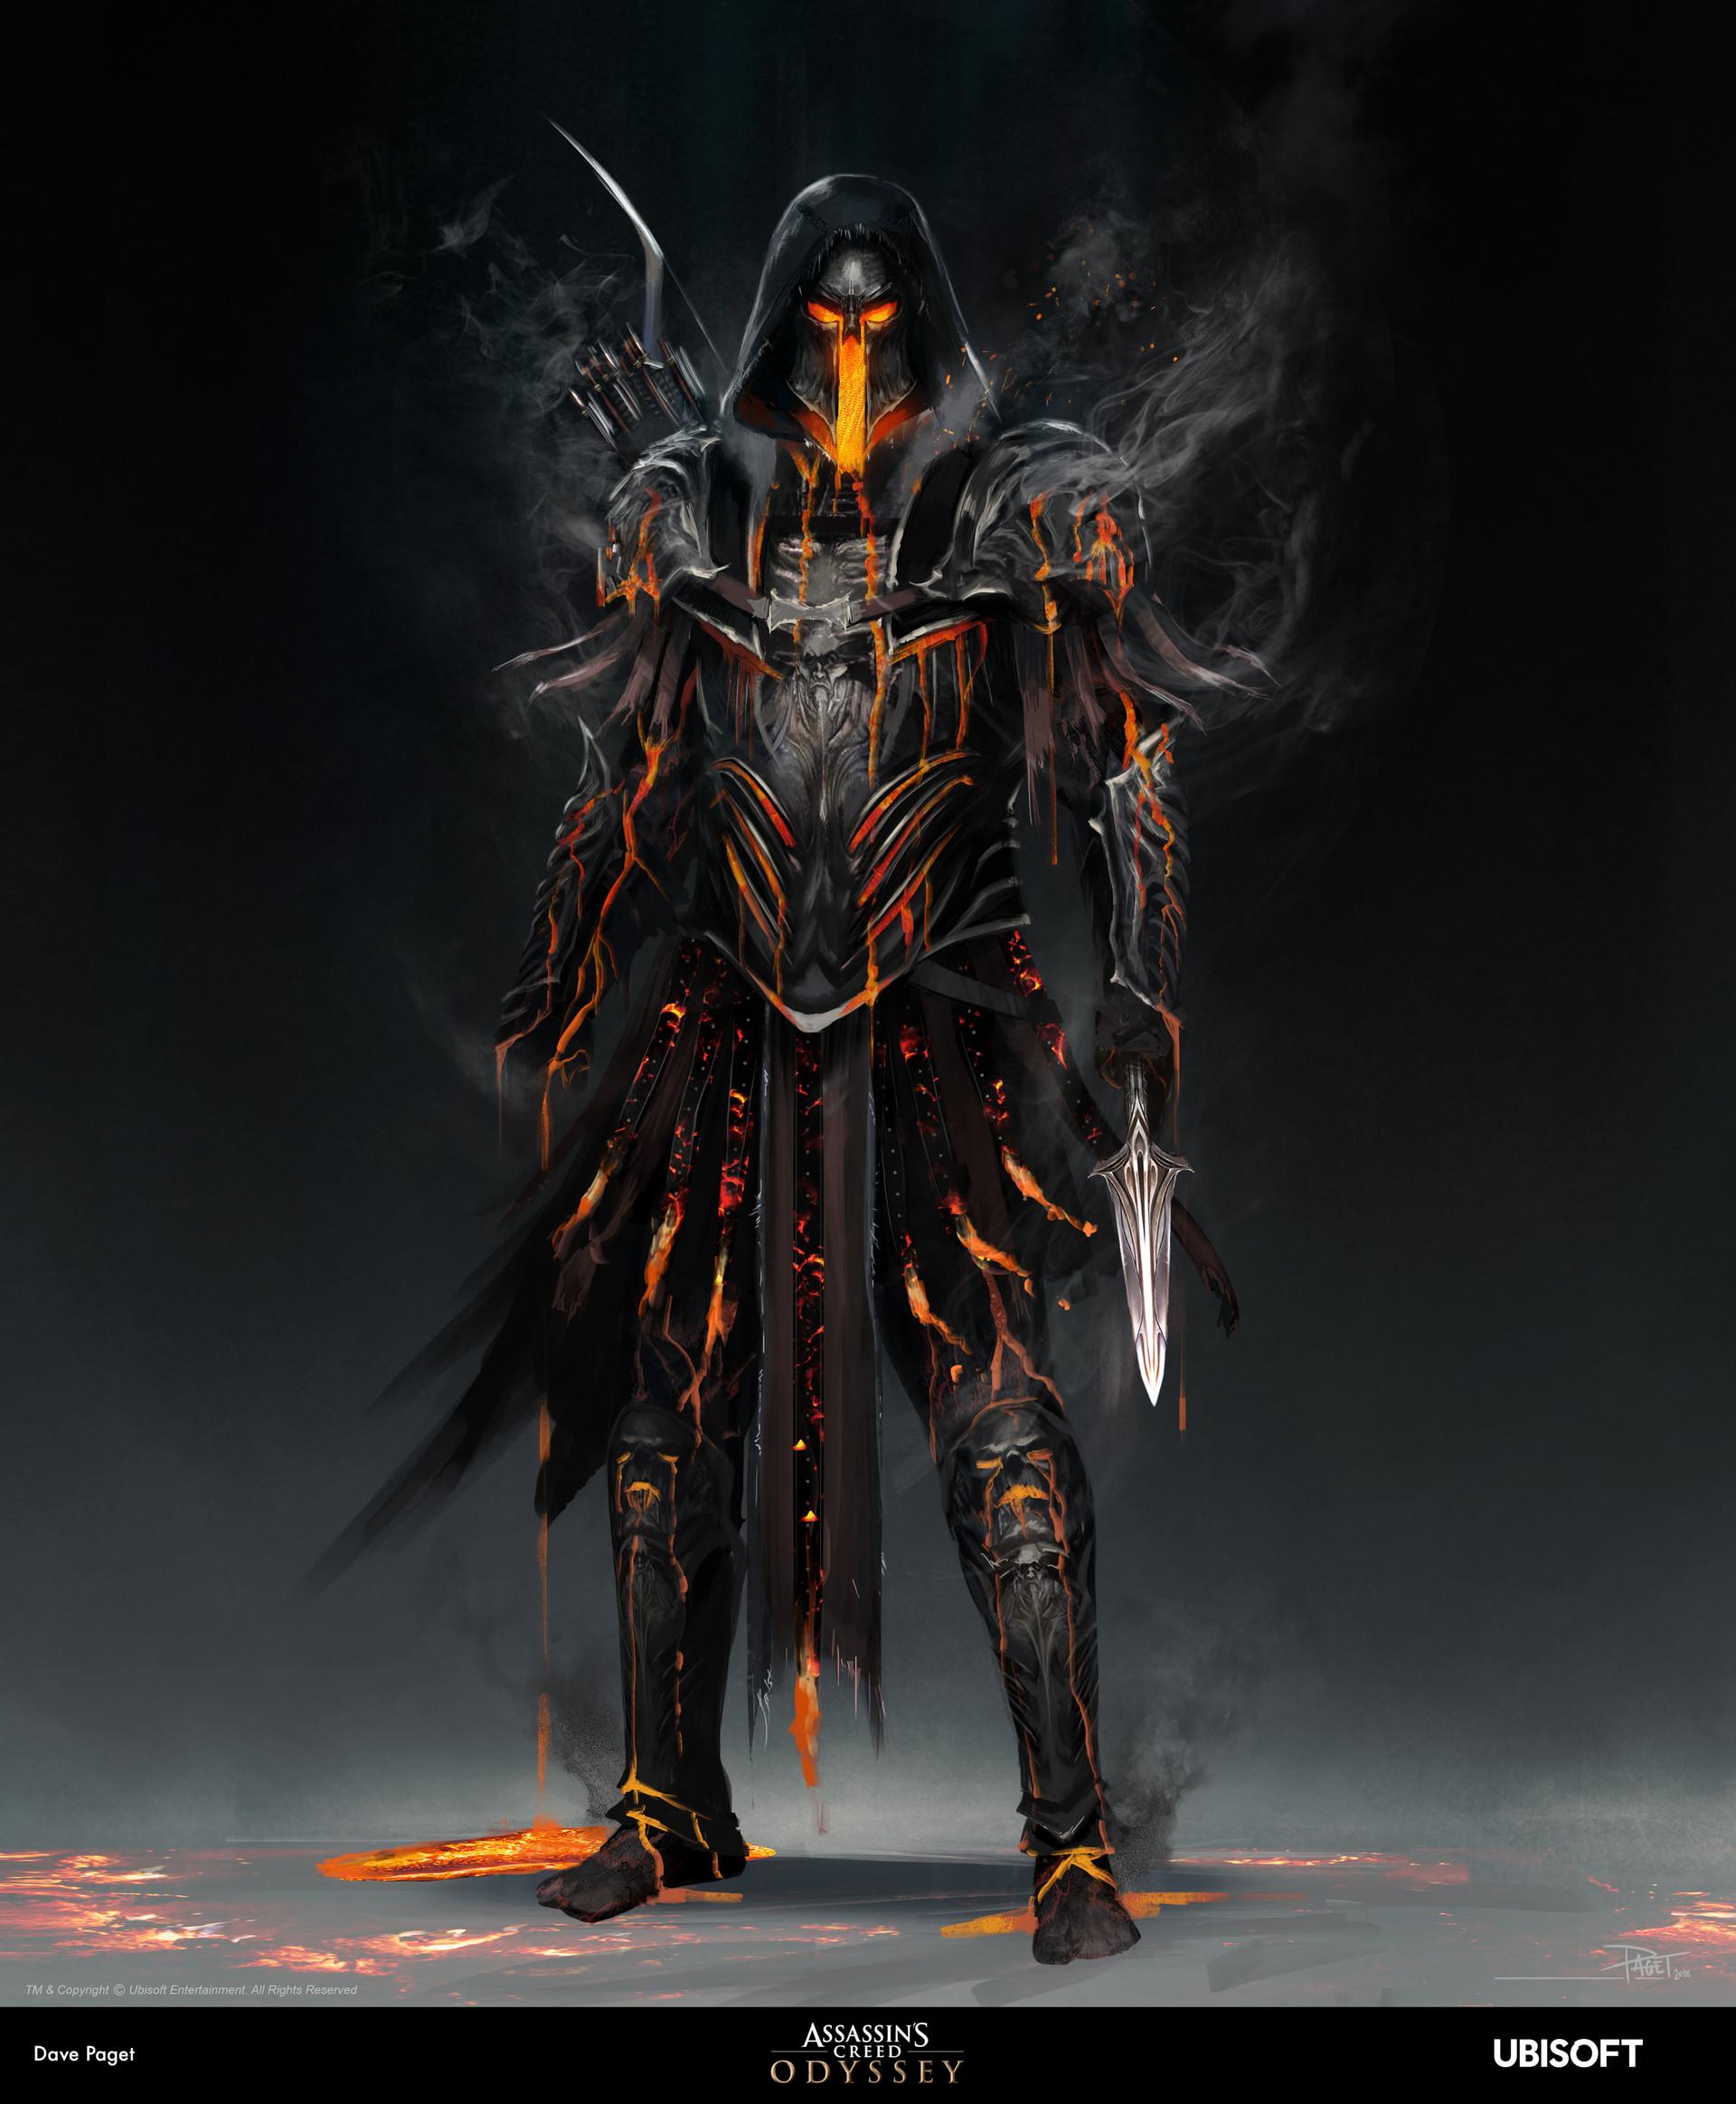 David paget underworld armour